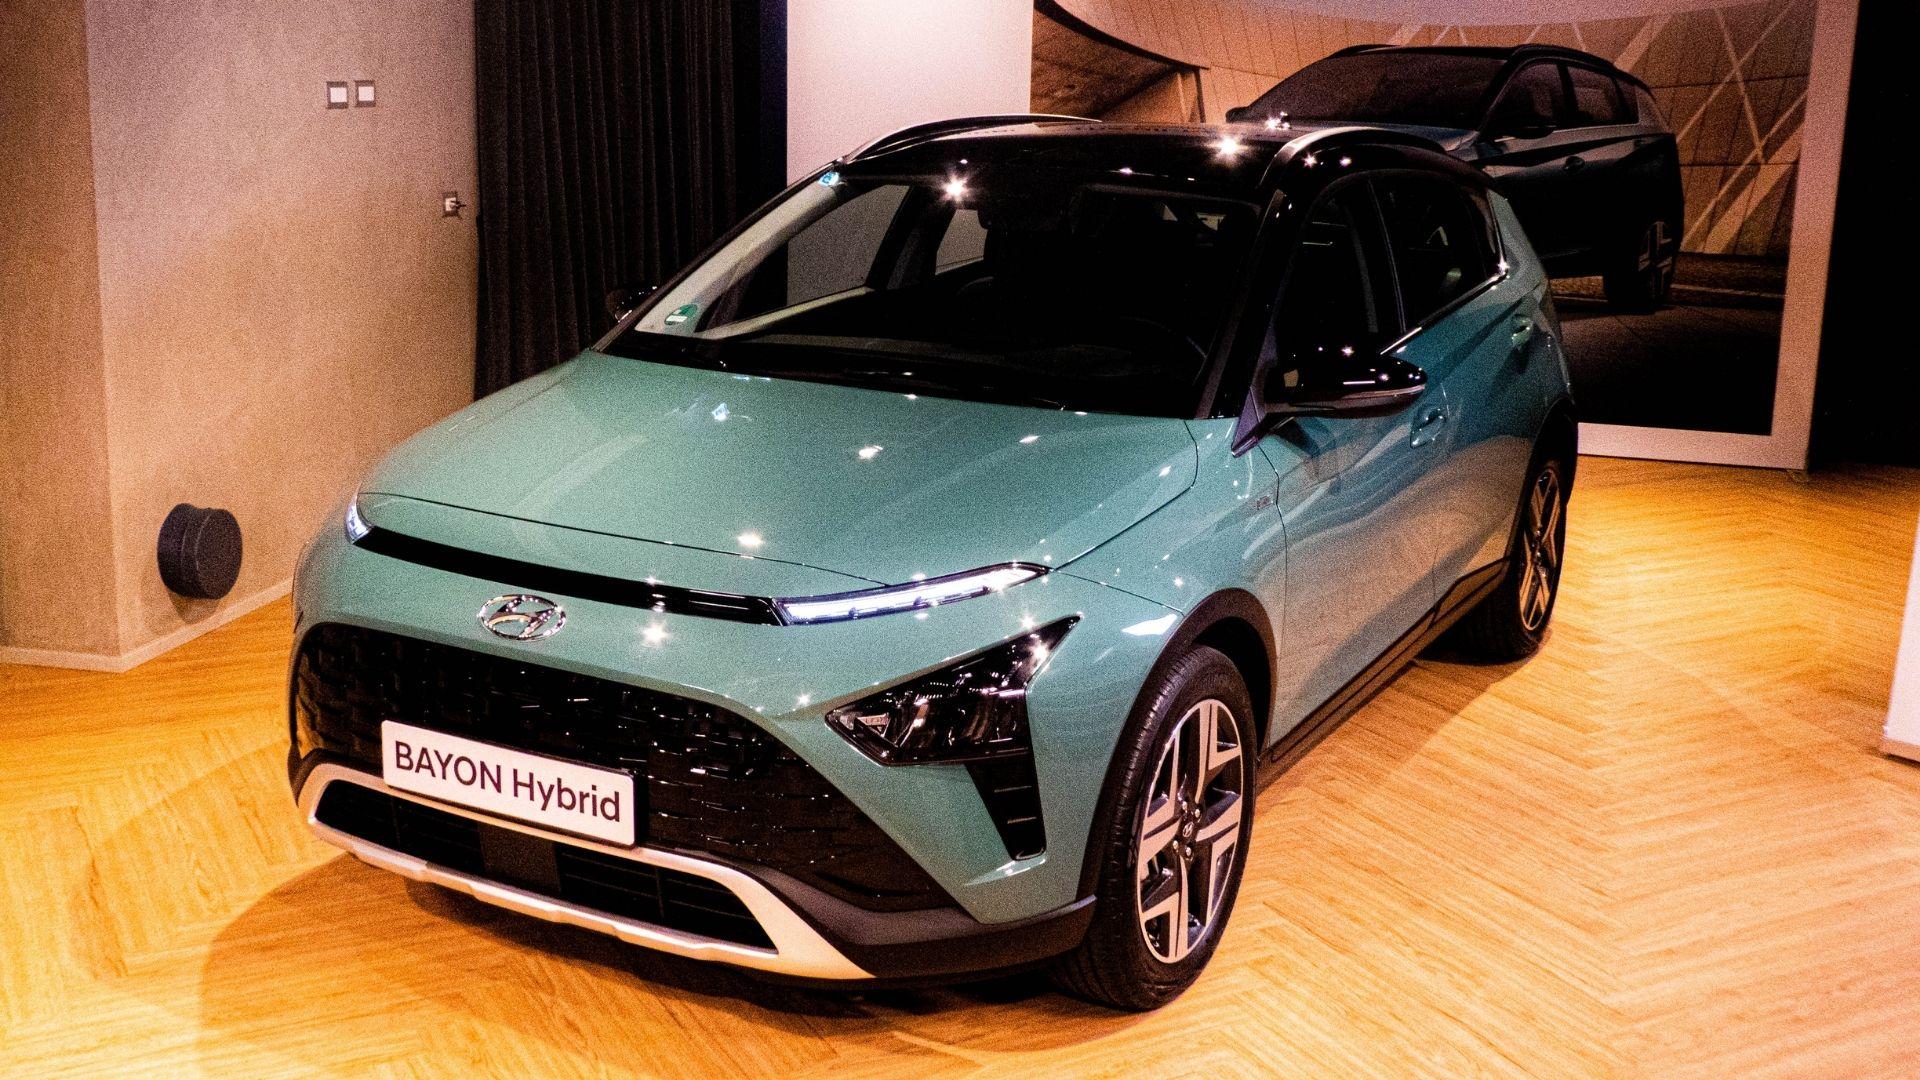 Nuova Hyundai Bayon in anteprima a Milano